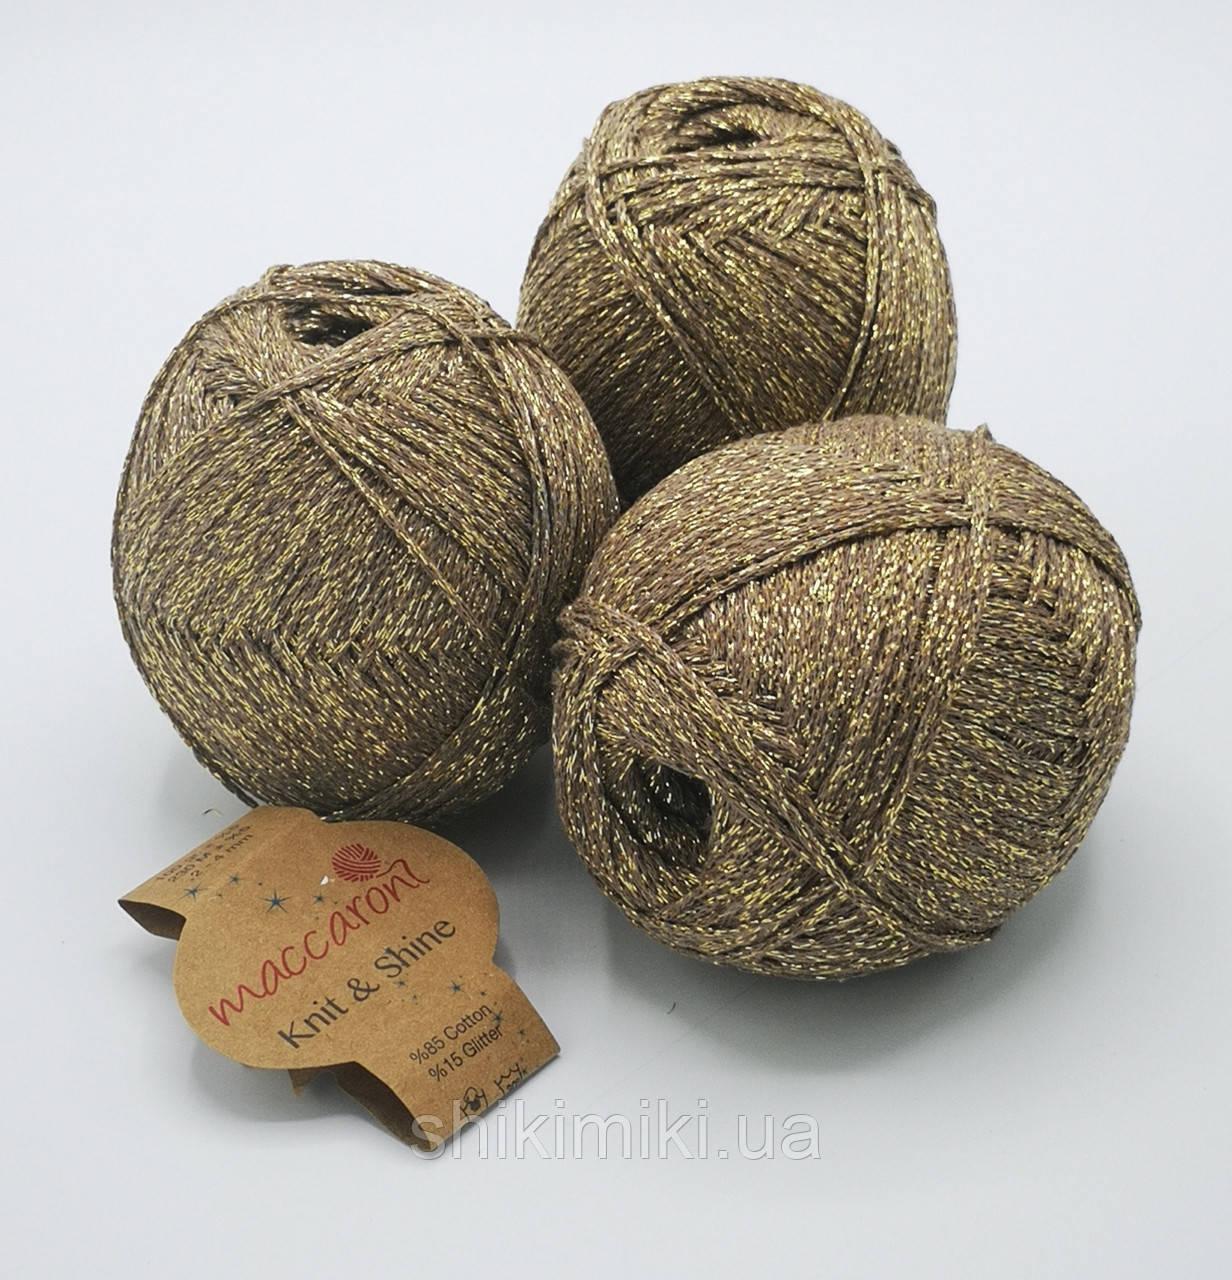 Трикотажный шнур с люрексом Knit & Shine, цвет Тауп